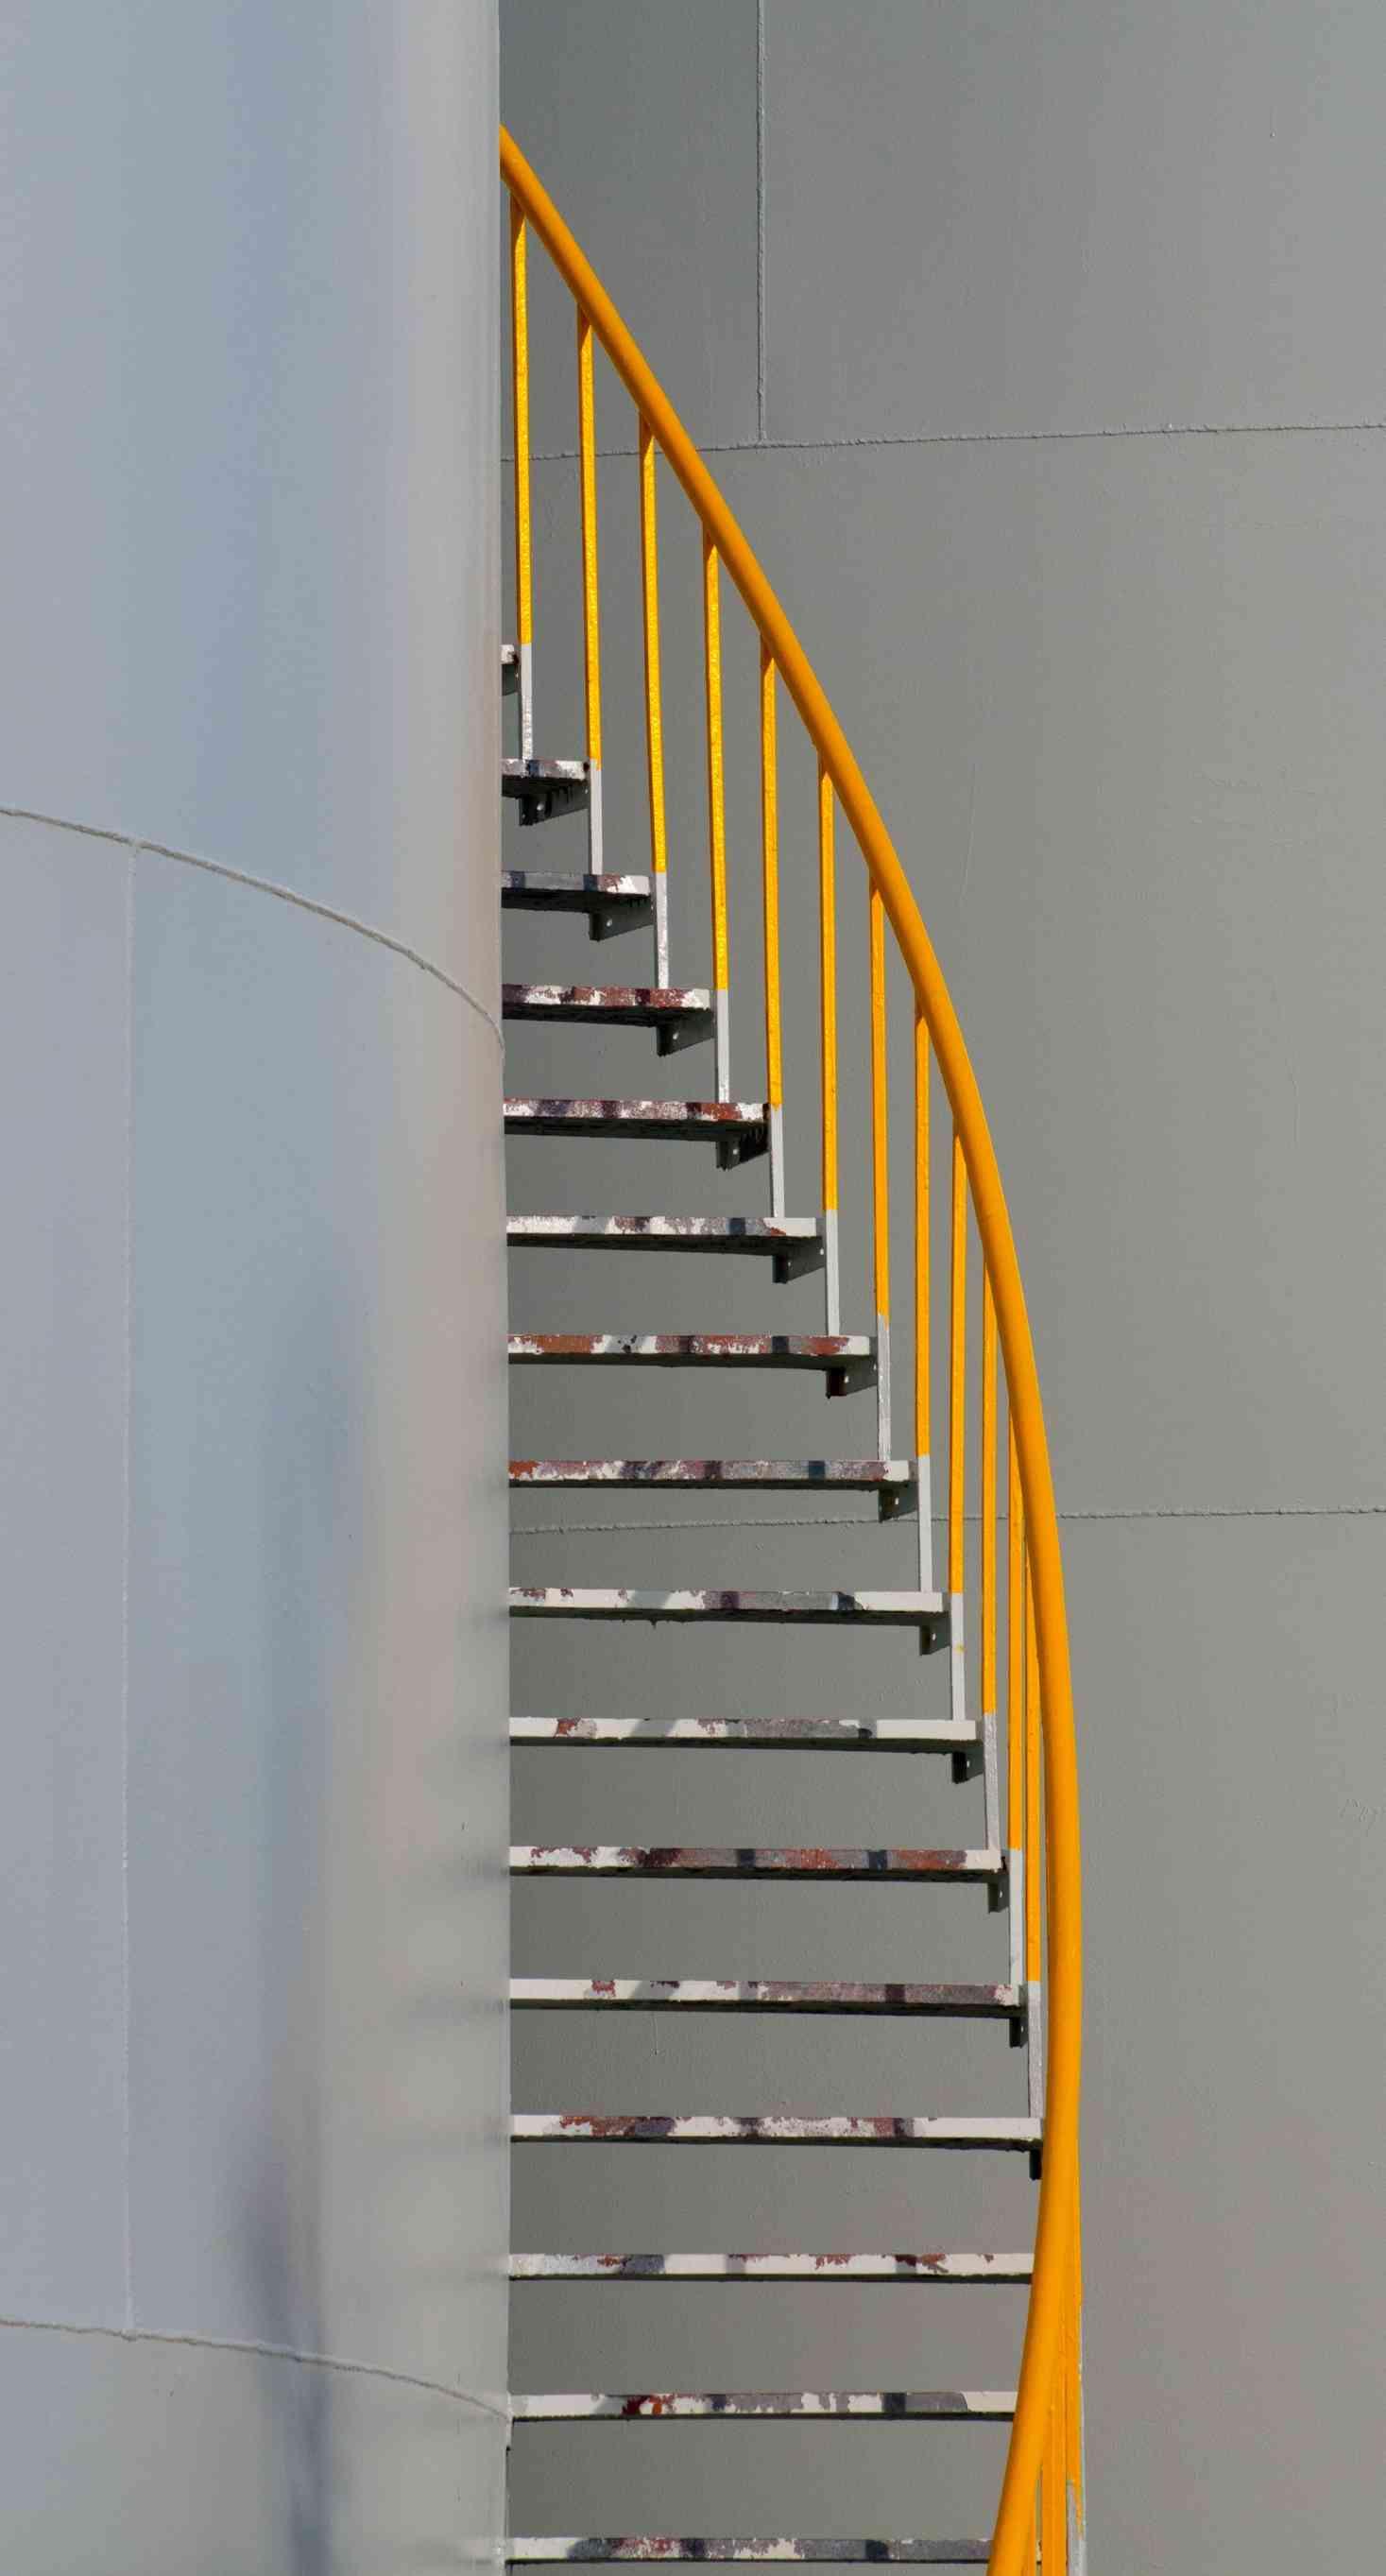 Escaliers metallique